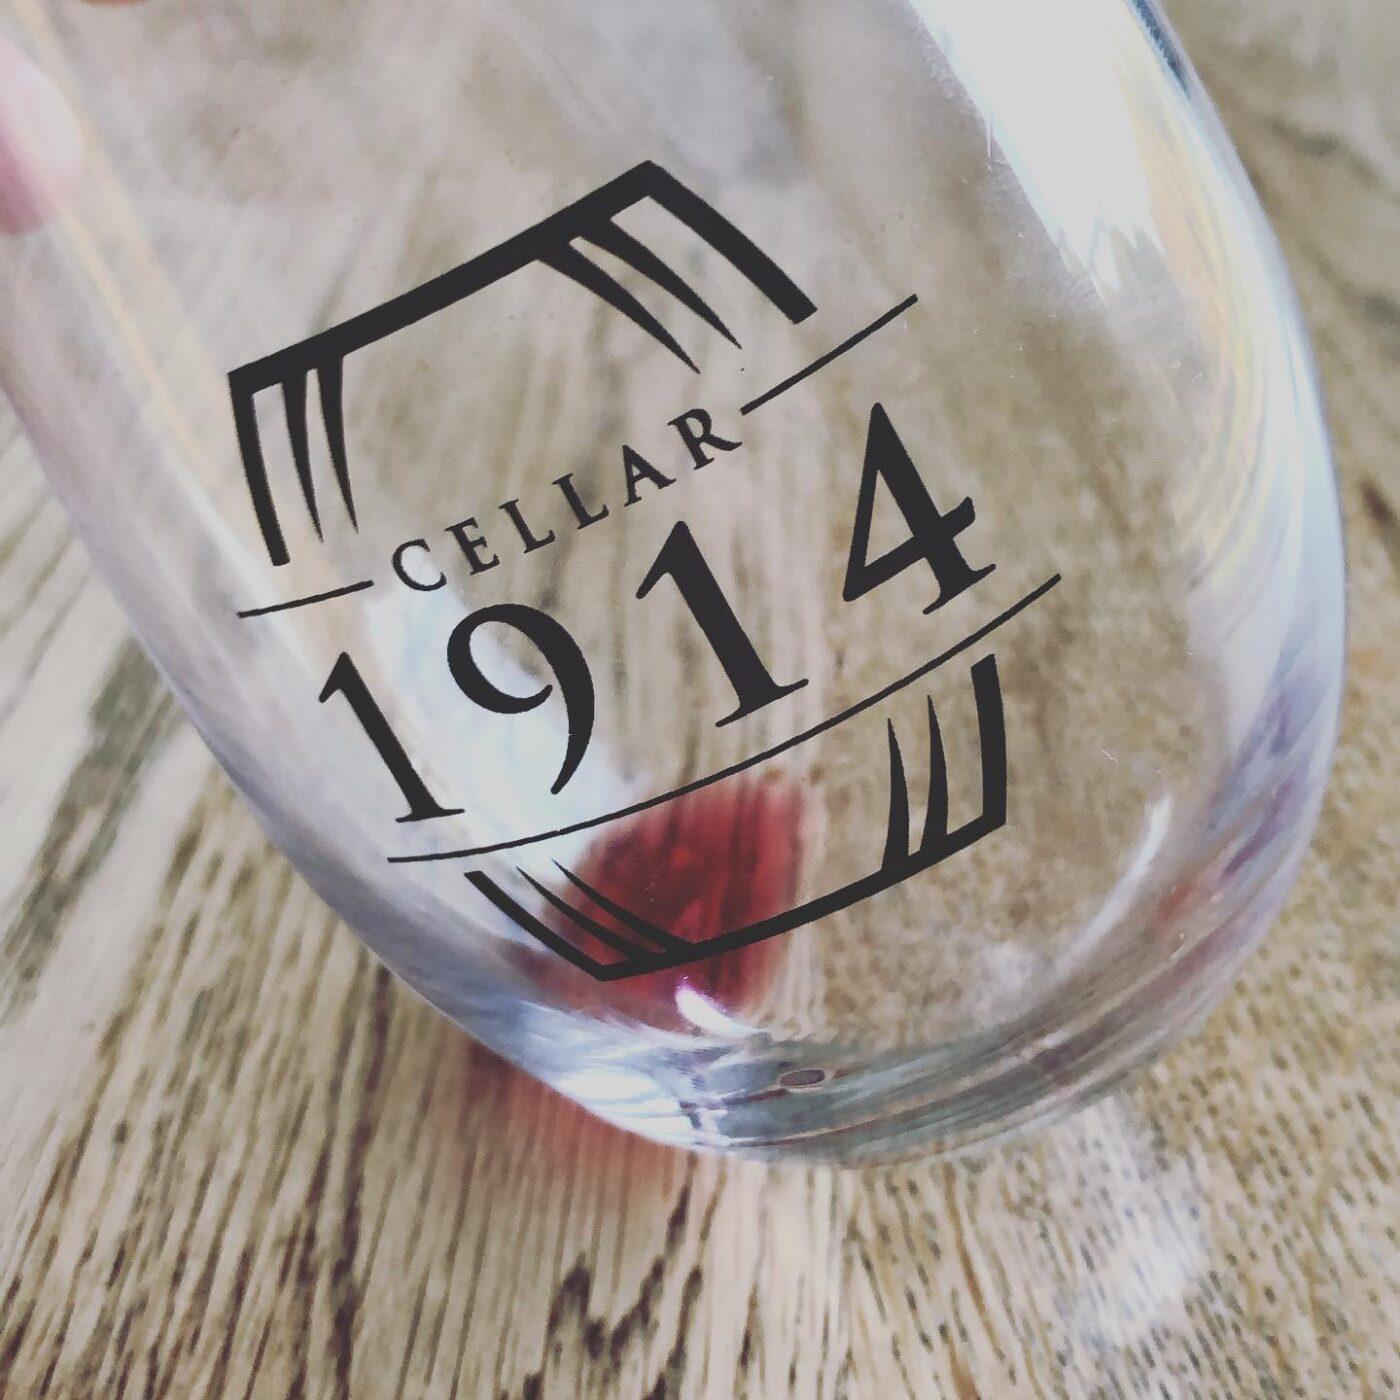 cellar 1914 8